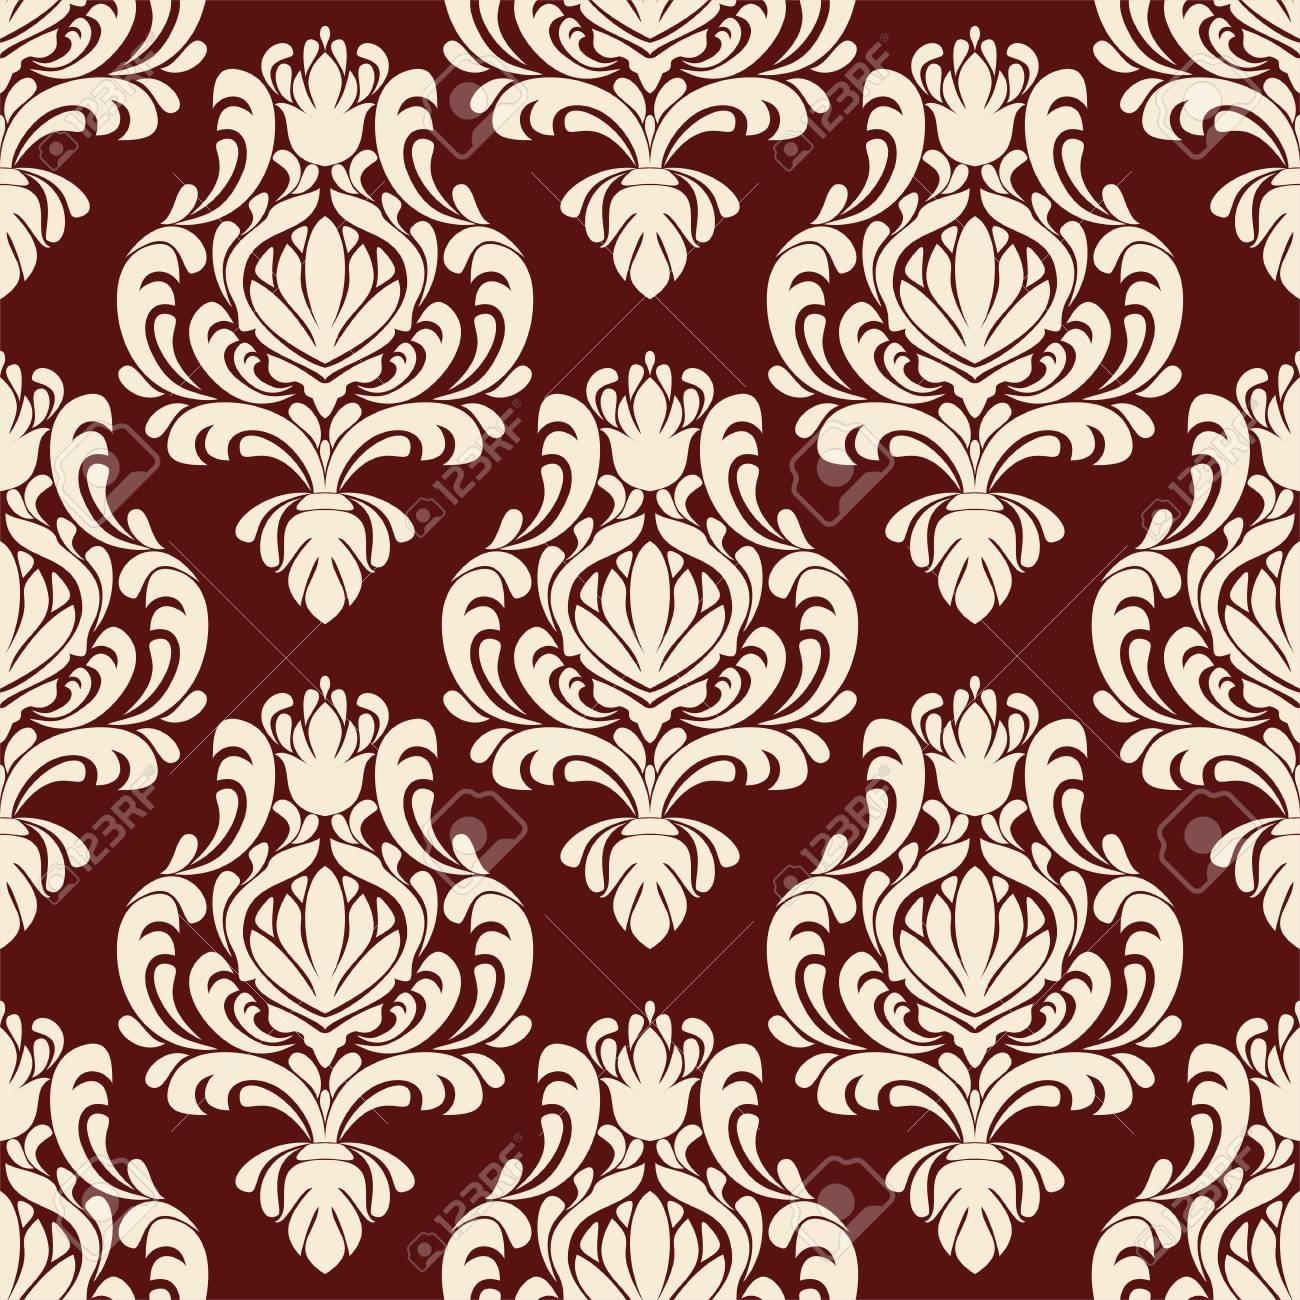 Rich ornamental damask Wallpaper for design - 103610163